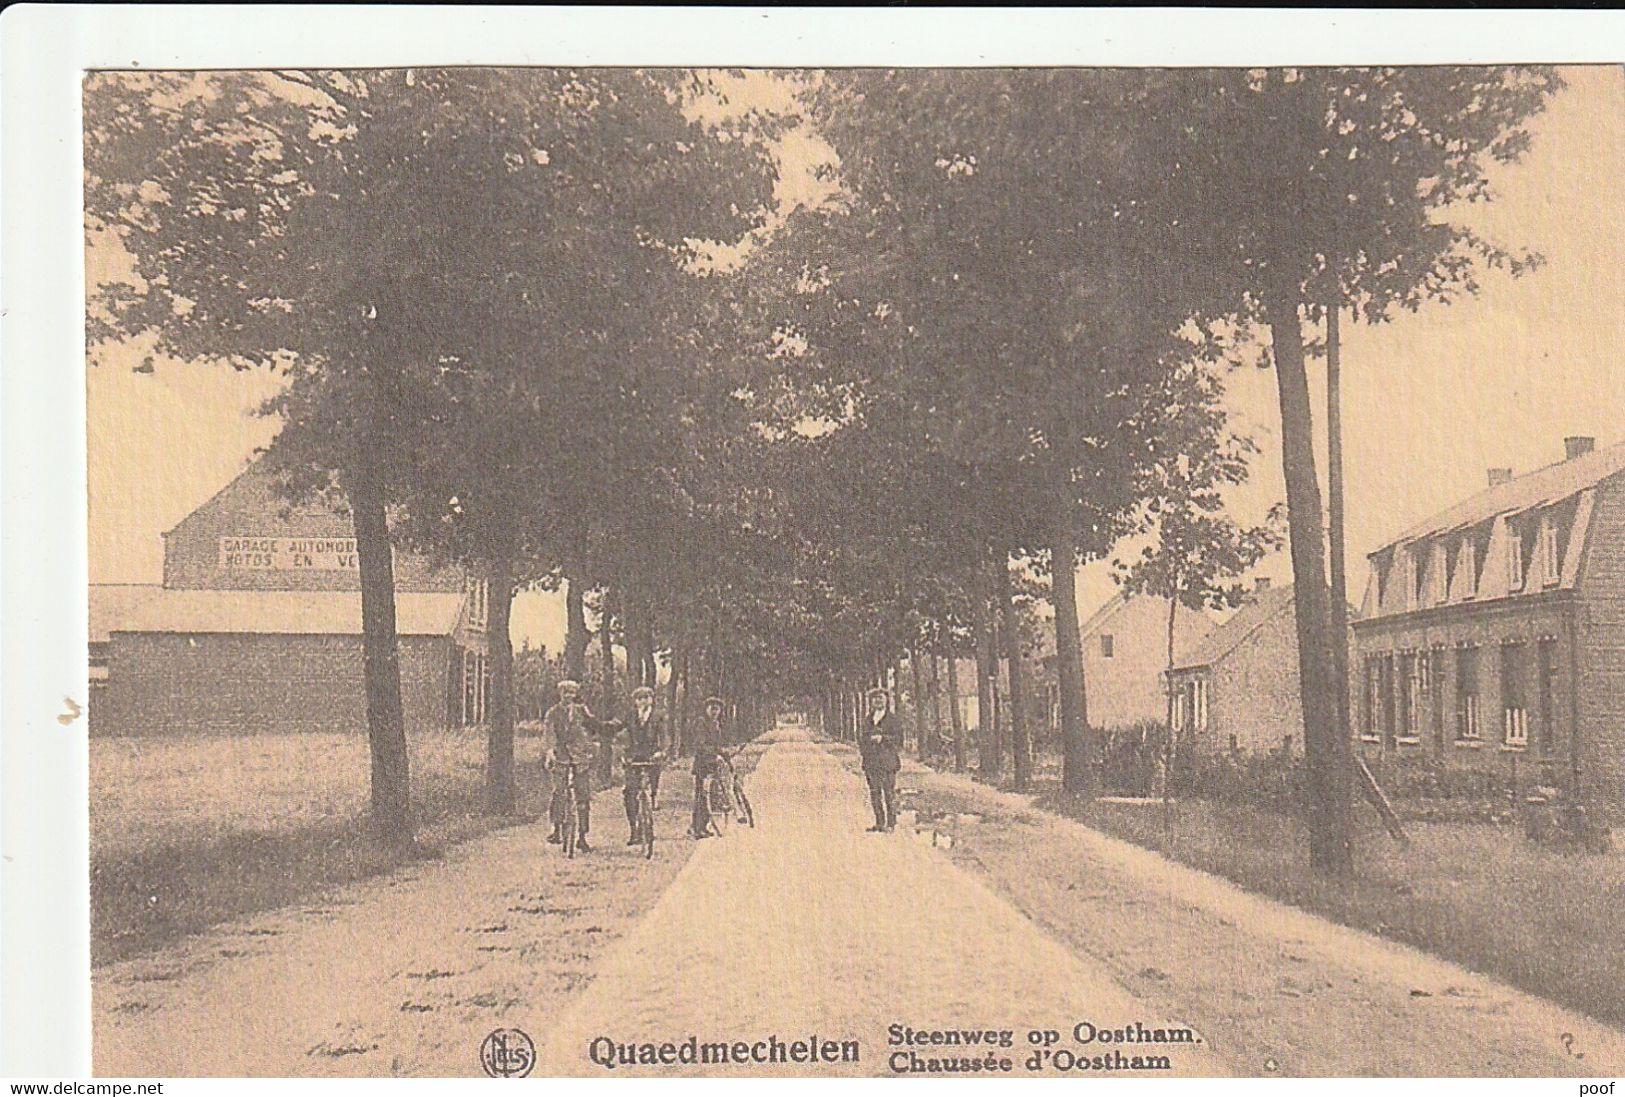 Quaedmechelen / Kwaadmechelen : Steenweg Op Oostham - Ham